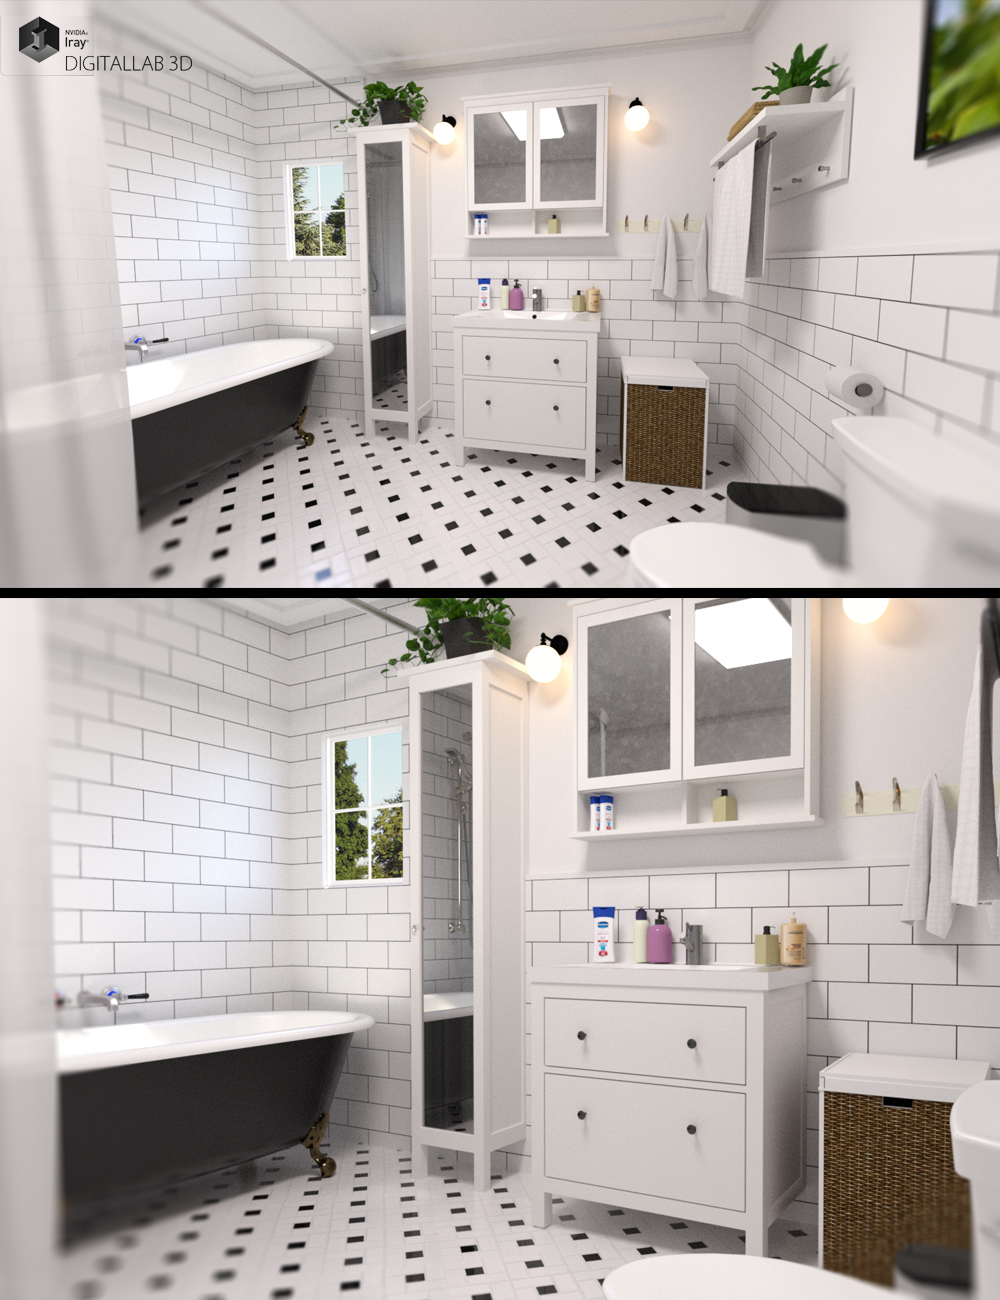 Apartment Bathroom by: Digitallab3D, 3D Models by Daz 3D